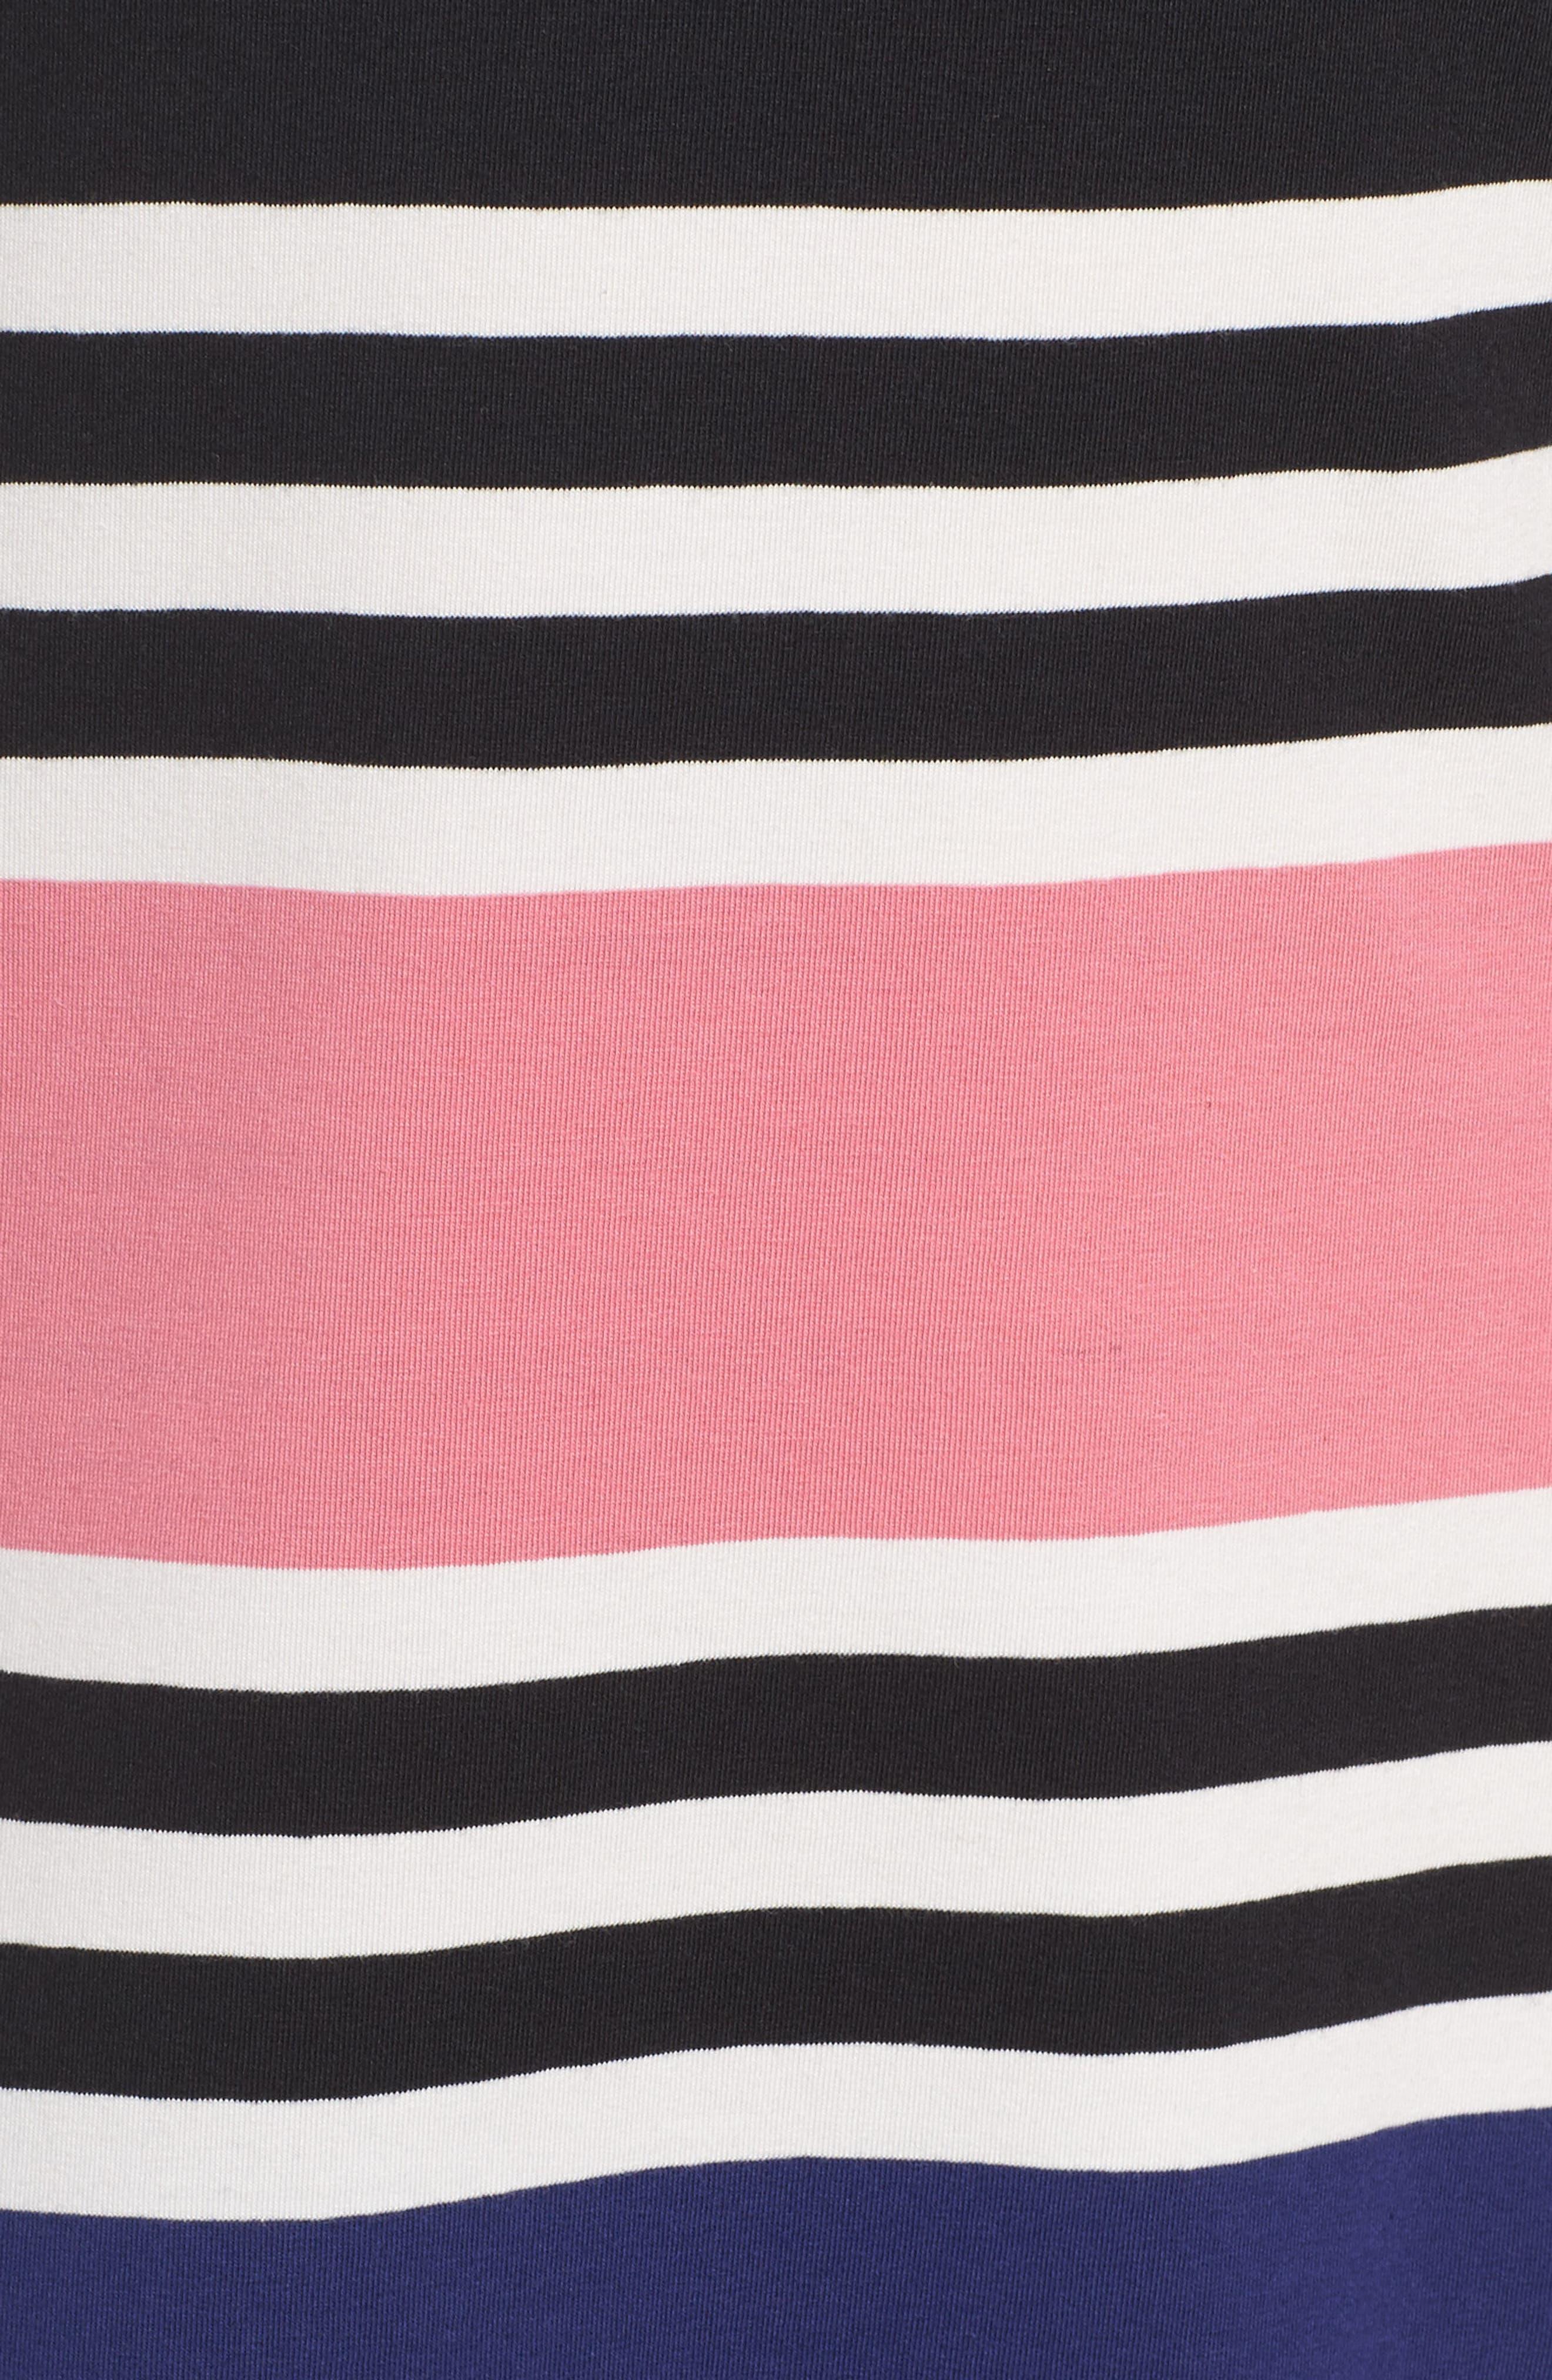 Alternate Image 5  - French Connection Multi Jag Stripe T-Shirt Dress